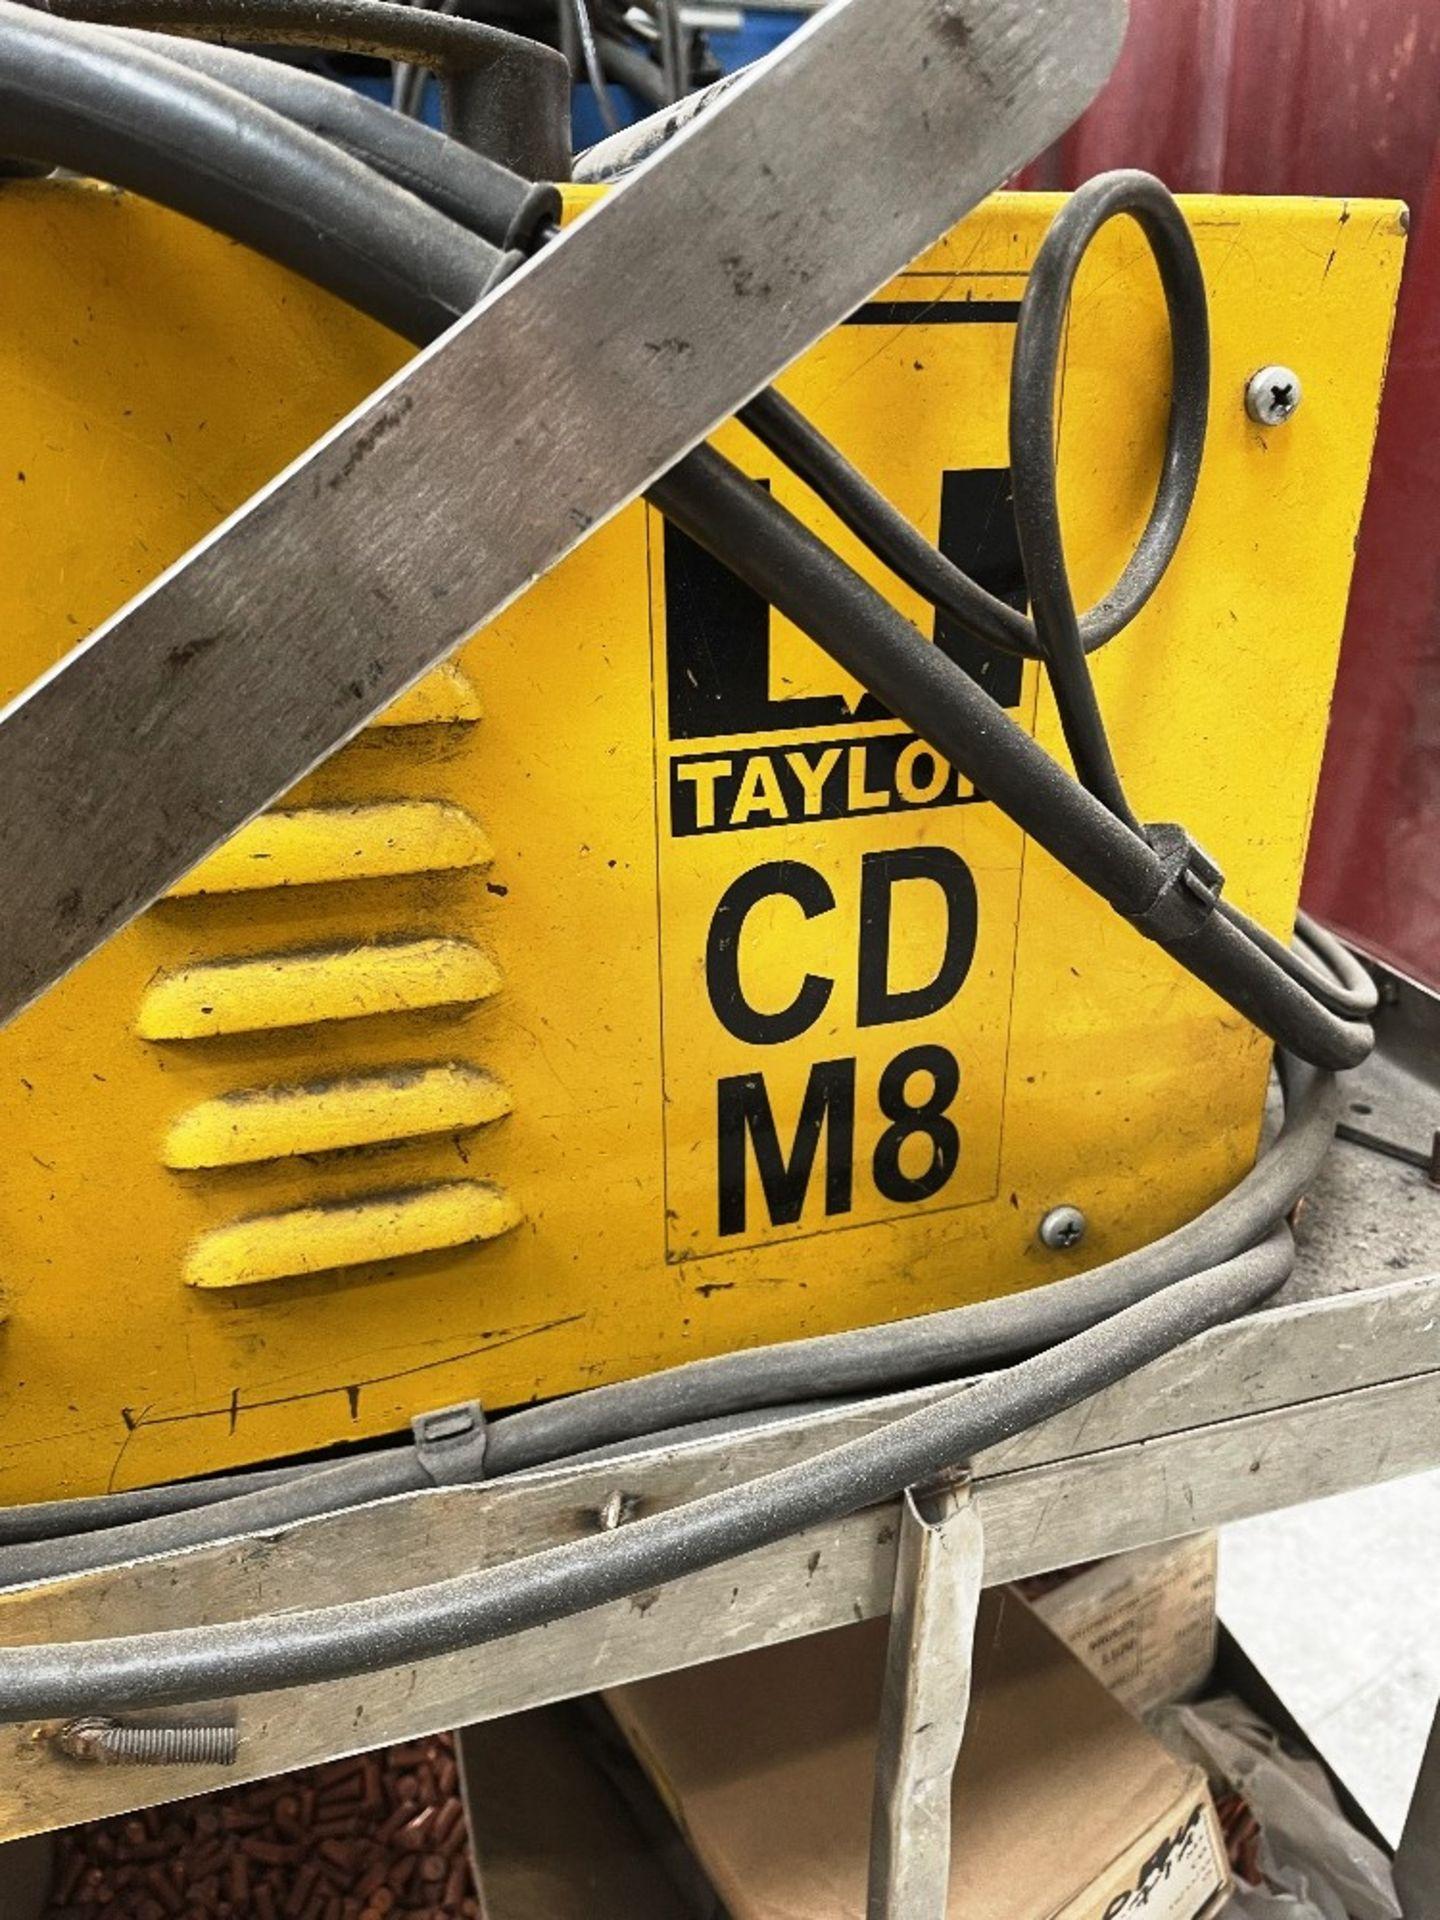 Taylor CDM8 Capacitor Discharge Stud Welding Machine w/ Gun, Studs & Mobile Bench - Image 3 of 5